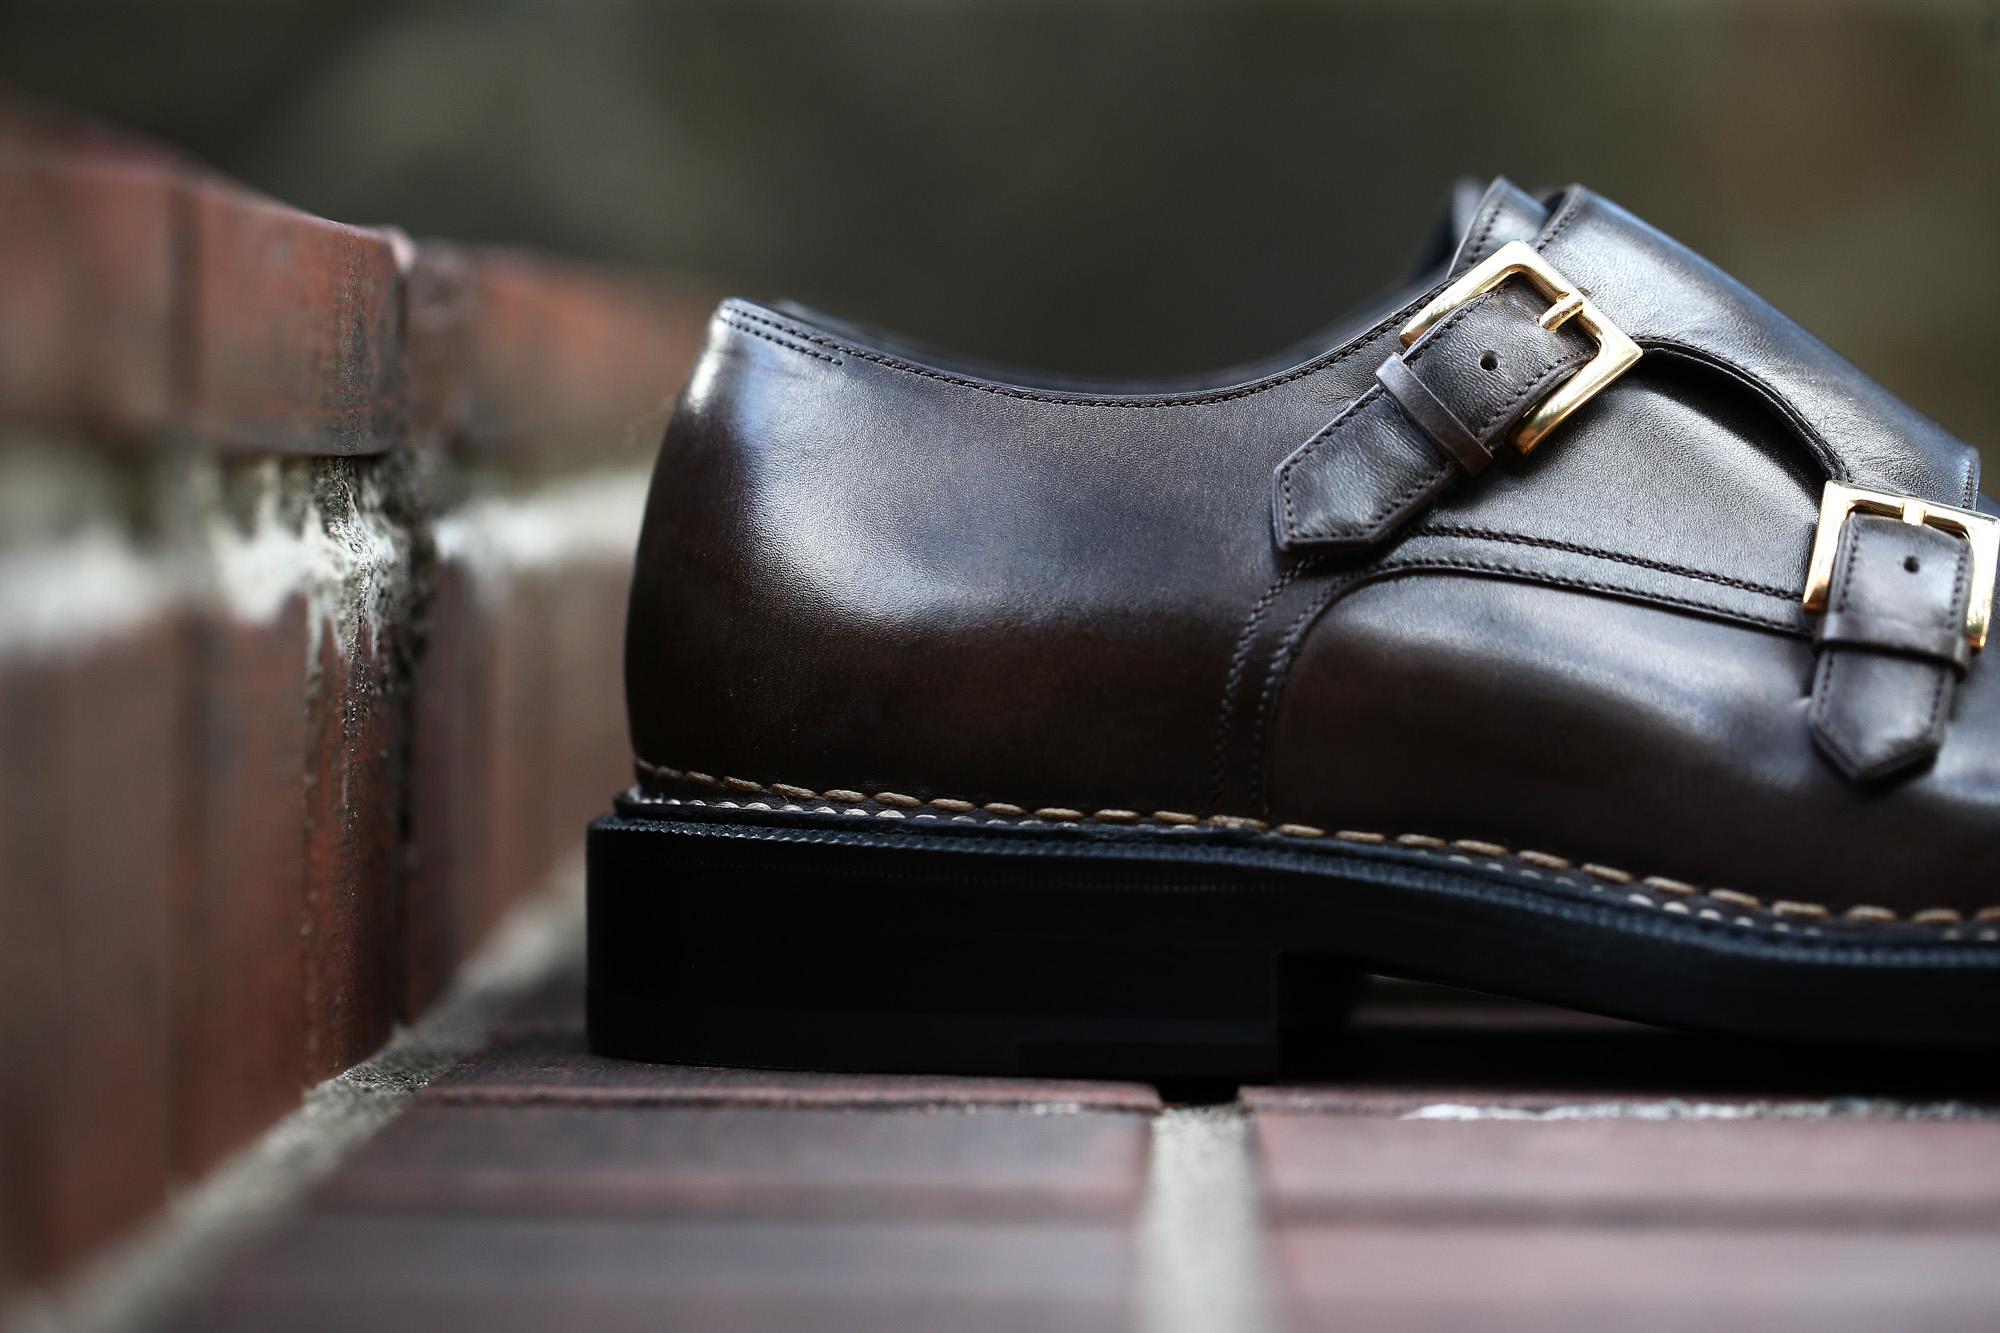 【ENZO BONAFE × HIROSHI TSUBOUCHI × ZODIAC /// エンツォボナフェ × ヒロシツボウチ × ゾディアック】 ART.EB-02 Double Monk Strap Shoes Bonaudo Museum Calf Leather ボナウド社 ミュージアムカーフ Norwegian Welted Process ノルベジェーゼ製法 ダブルモンクストラップシューズ PEWTER (ピューター) made in italy (イタリア製) 2017 秋冬新作 【Special Model】 enzobonafe hiroshitsubouchi エンツォボナフェ 愛知 名古屋 ZODIAC ゾディアック ダブルモンク